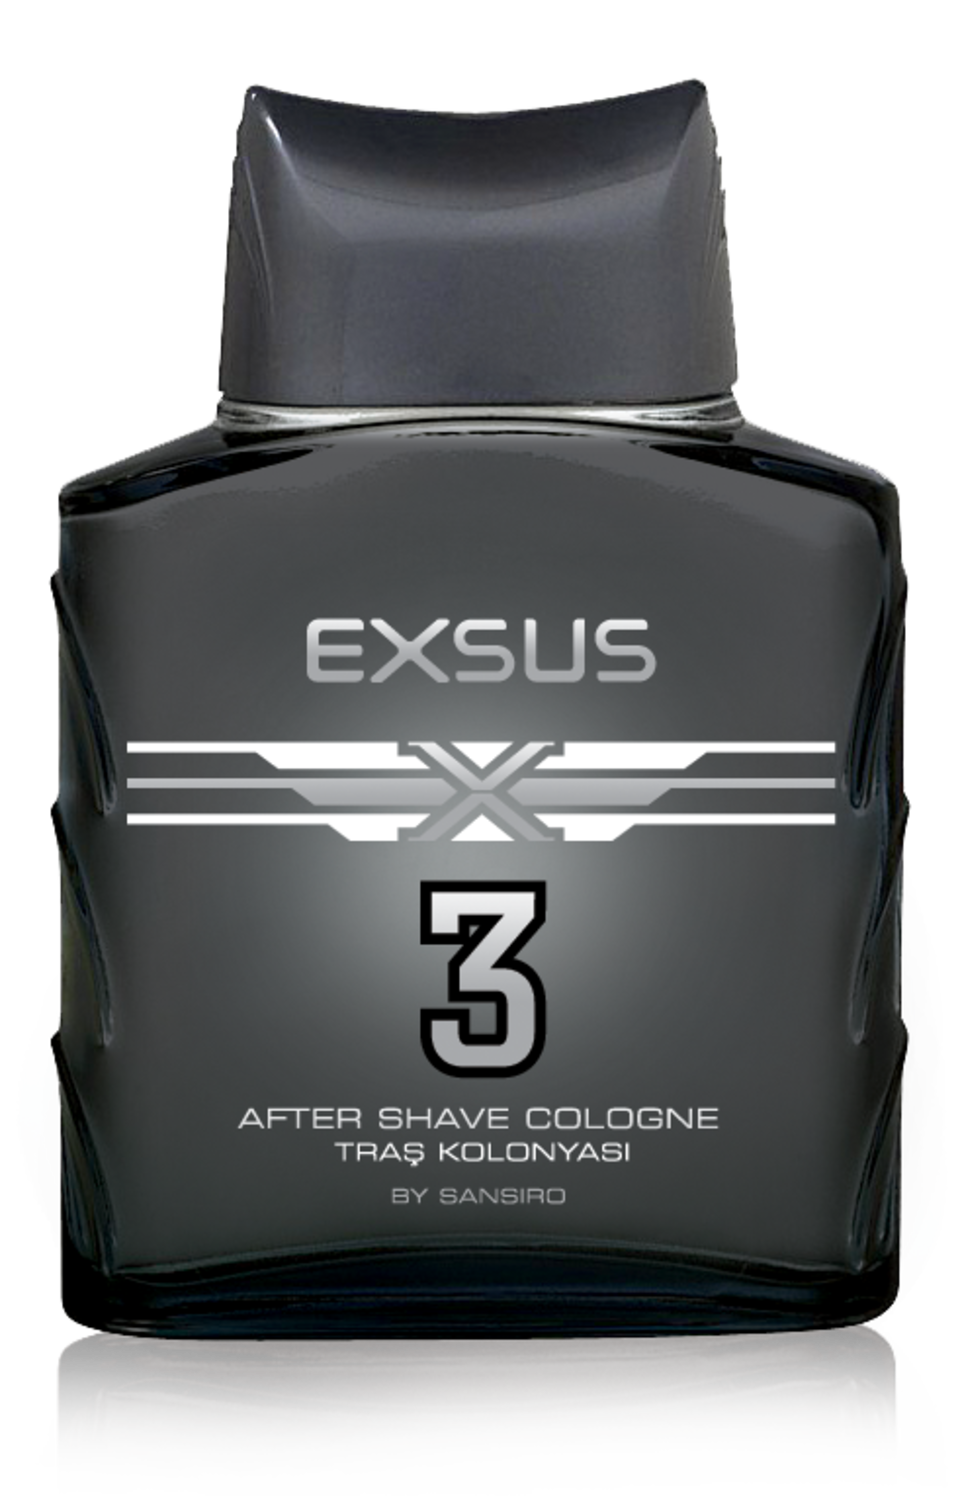 Sansiro Perfume -After Shave - Exsus 3